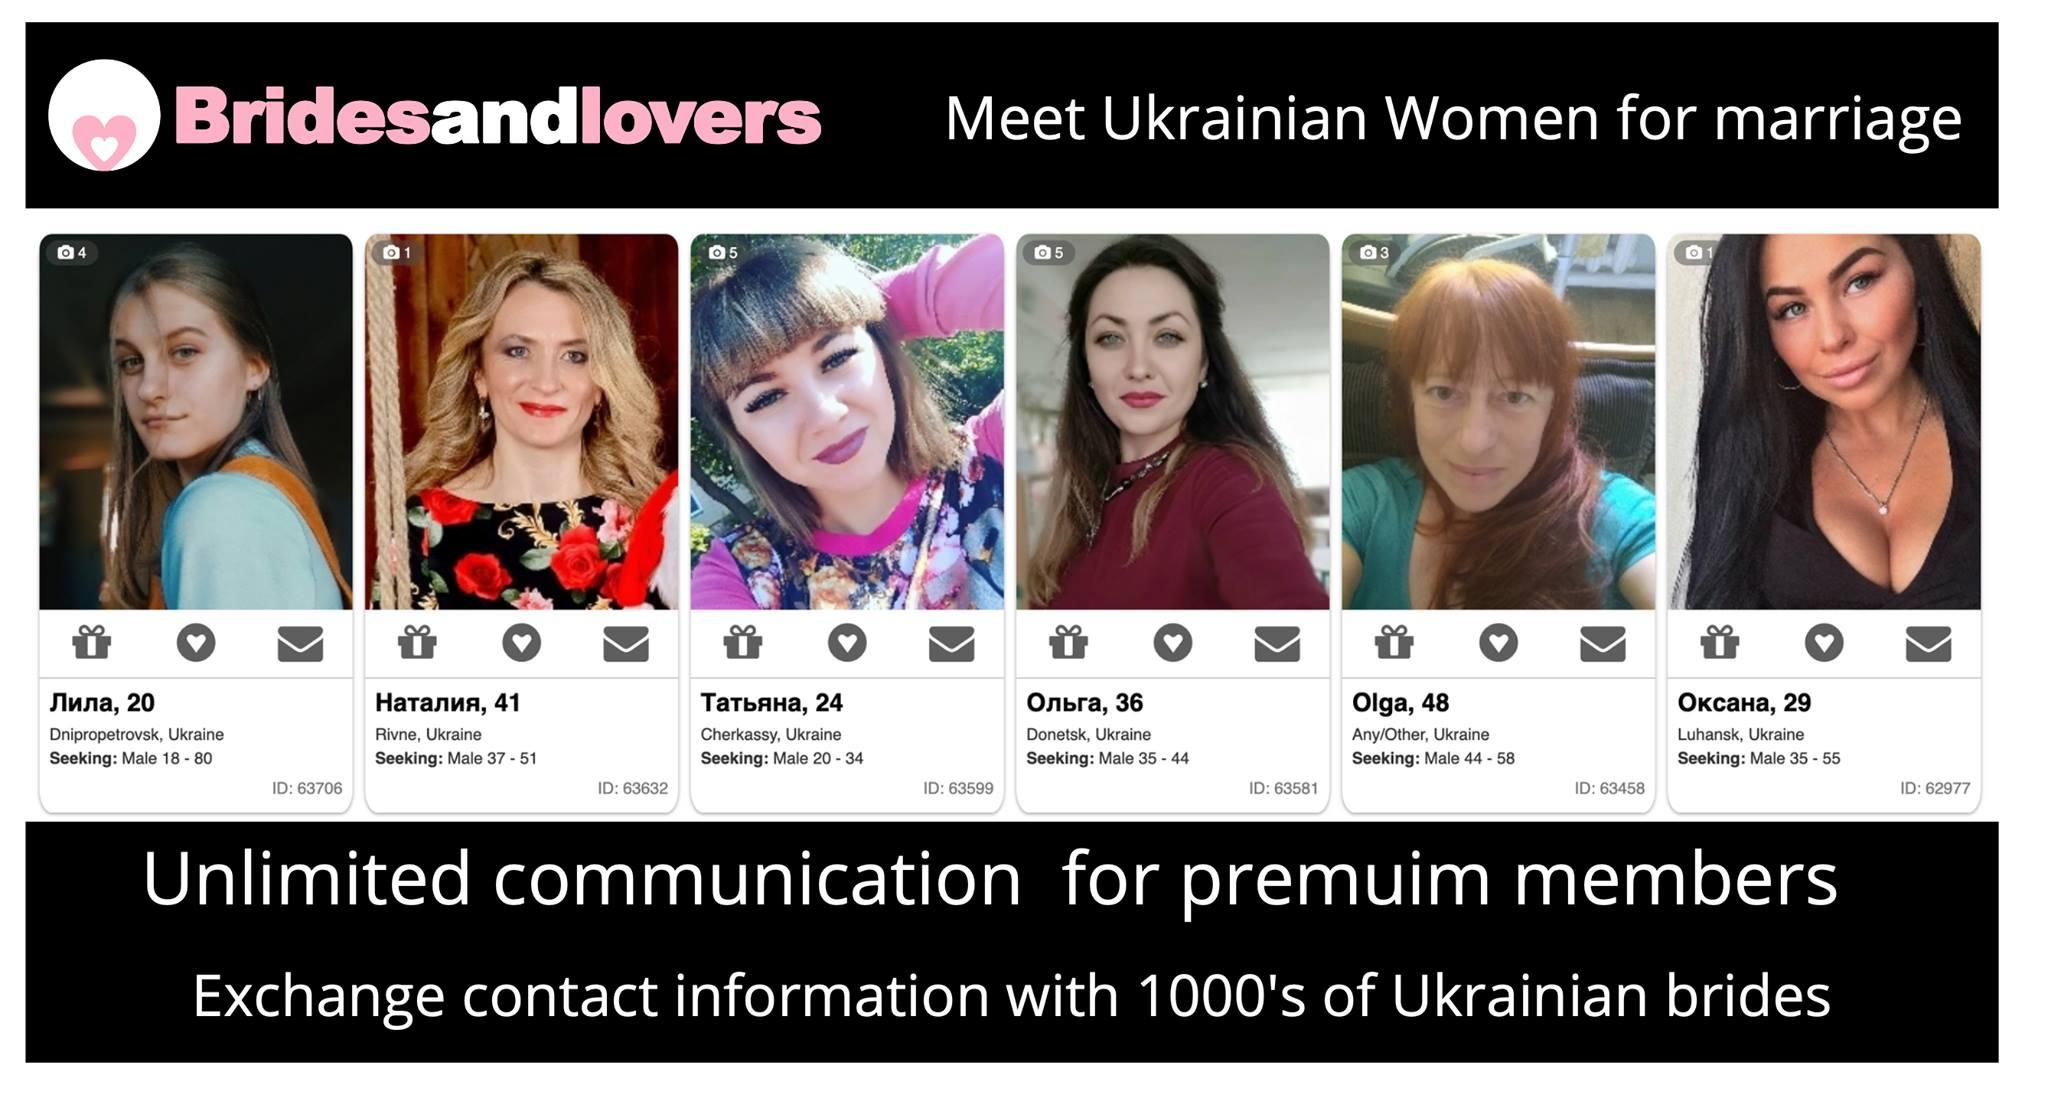 https://bridesandlovers.com/images/upload/filemanagers/success-stories/marry-ukrainian-brides.jpg